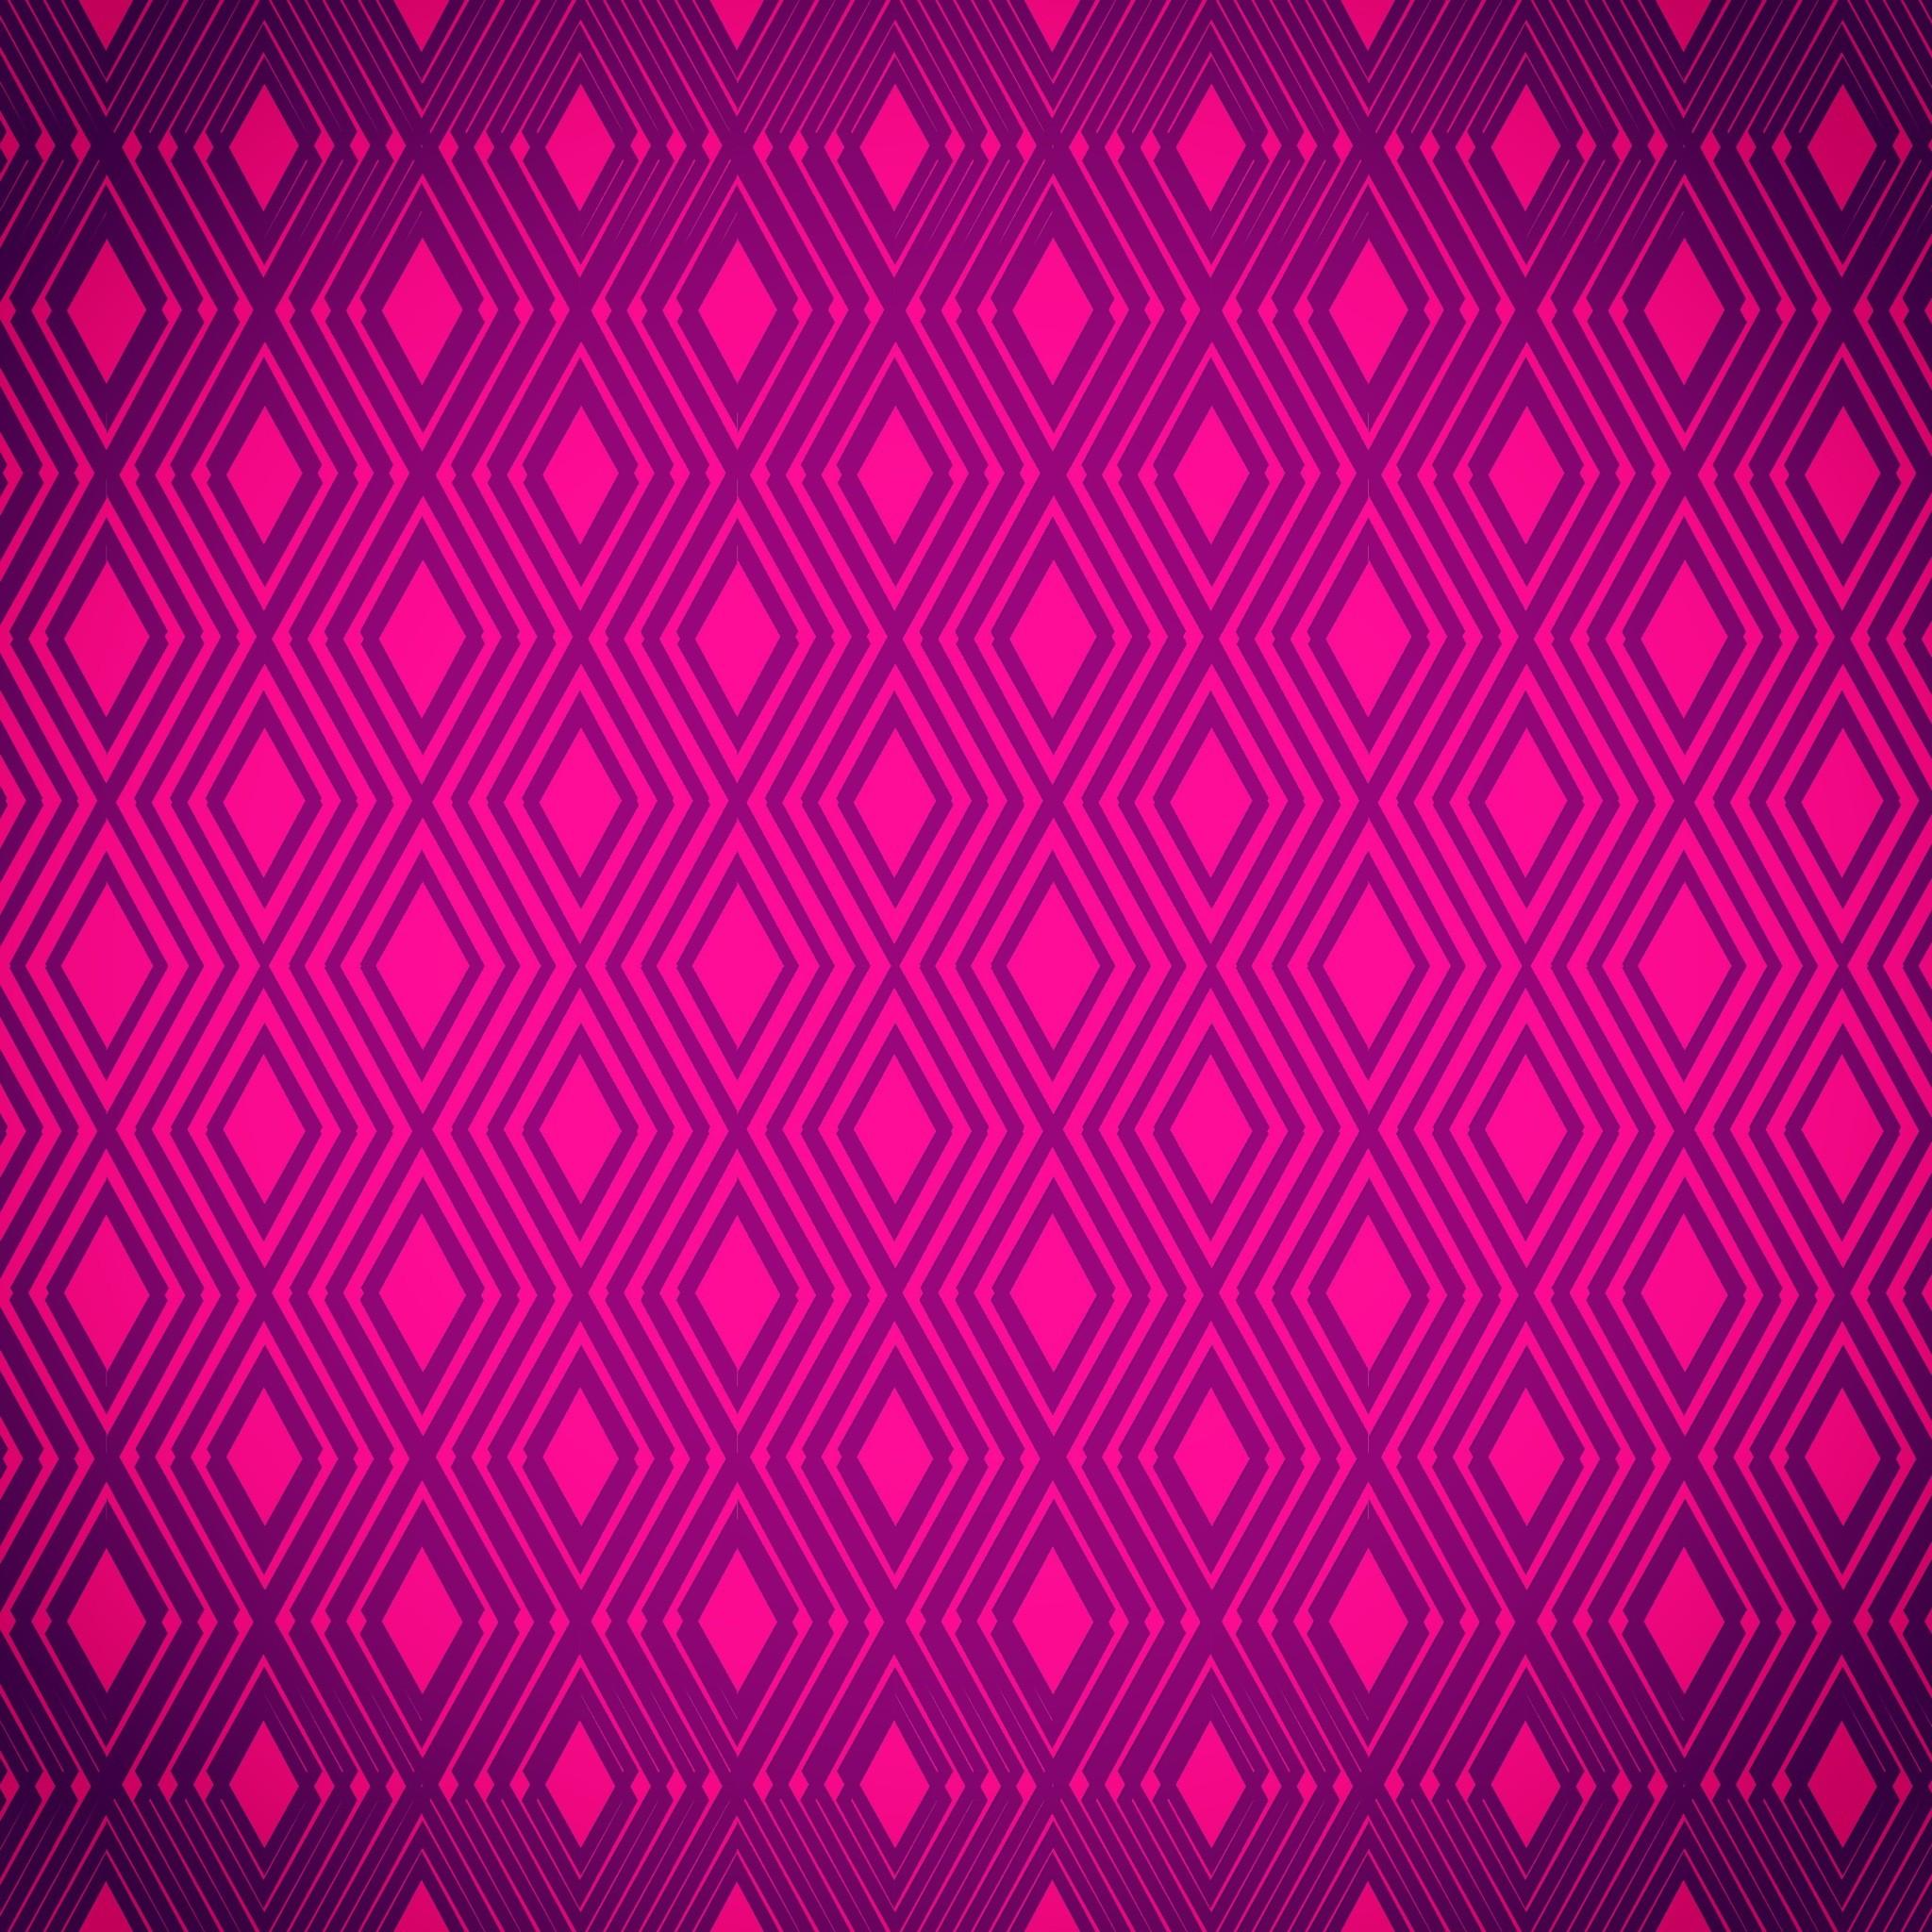 Iphone Wallpaper Pink: Neon Pink Wallpapers (59+ Images